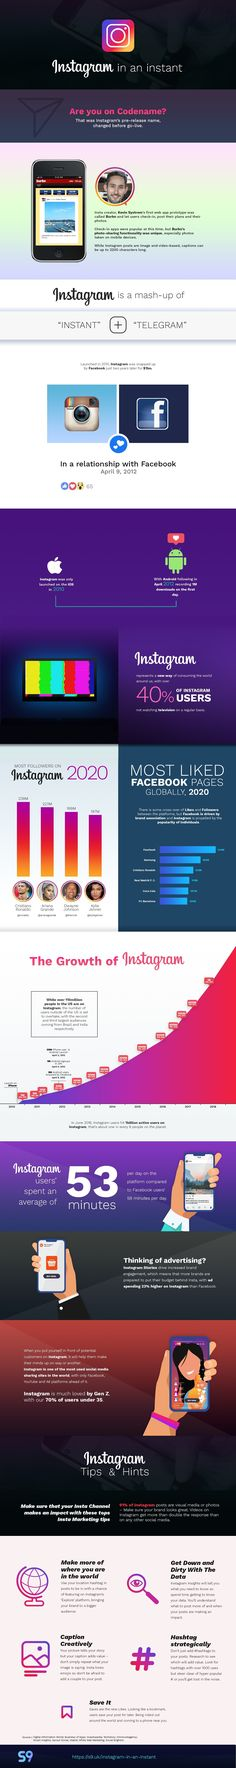 Social Media Services, Social Media Content, Social Networks, Erp System, Instagram Facts, Instagram Marketing Tips, Social Marketing, Affiliate Marketing, Media Marketing